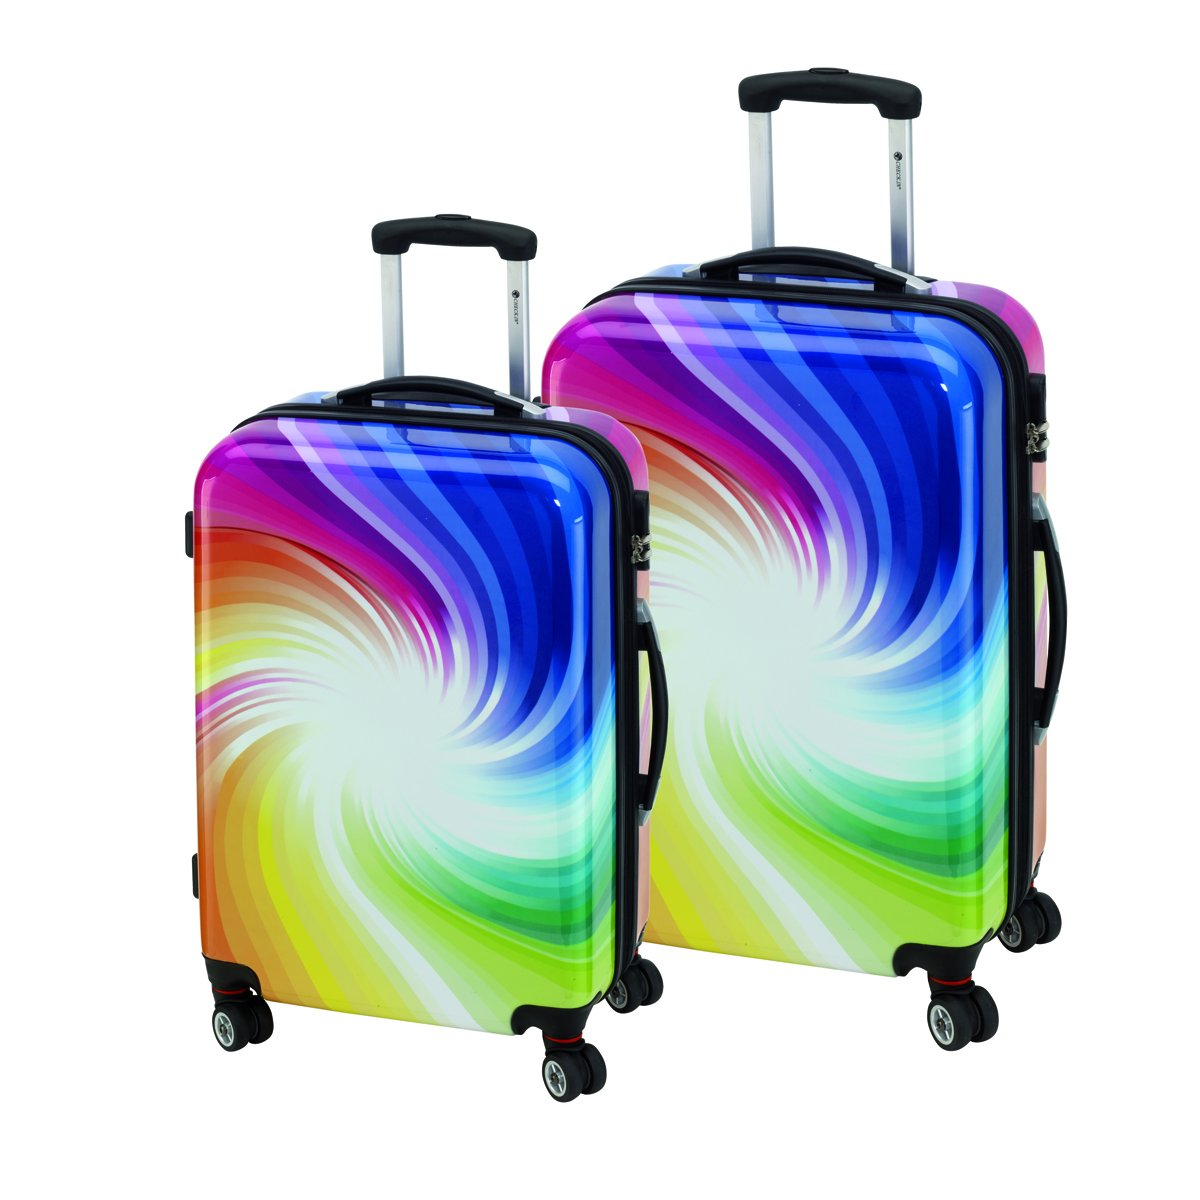 2-teiliges Trolley-Koffer-Set Reisekoffer Hartschale TWISTER Bunt sonstige